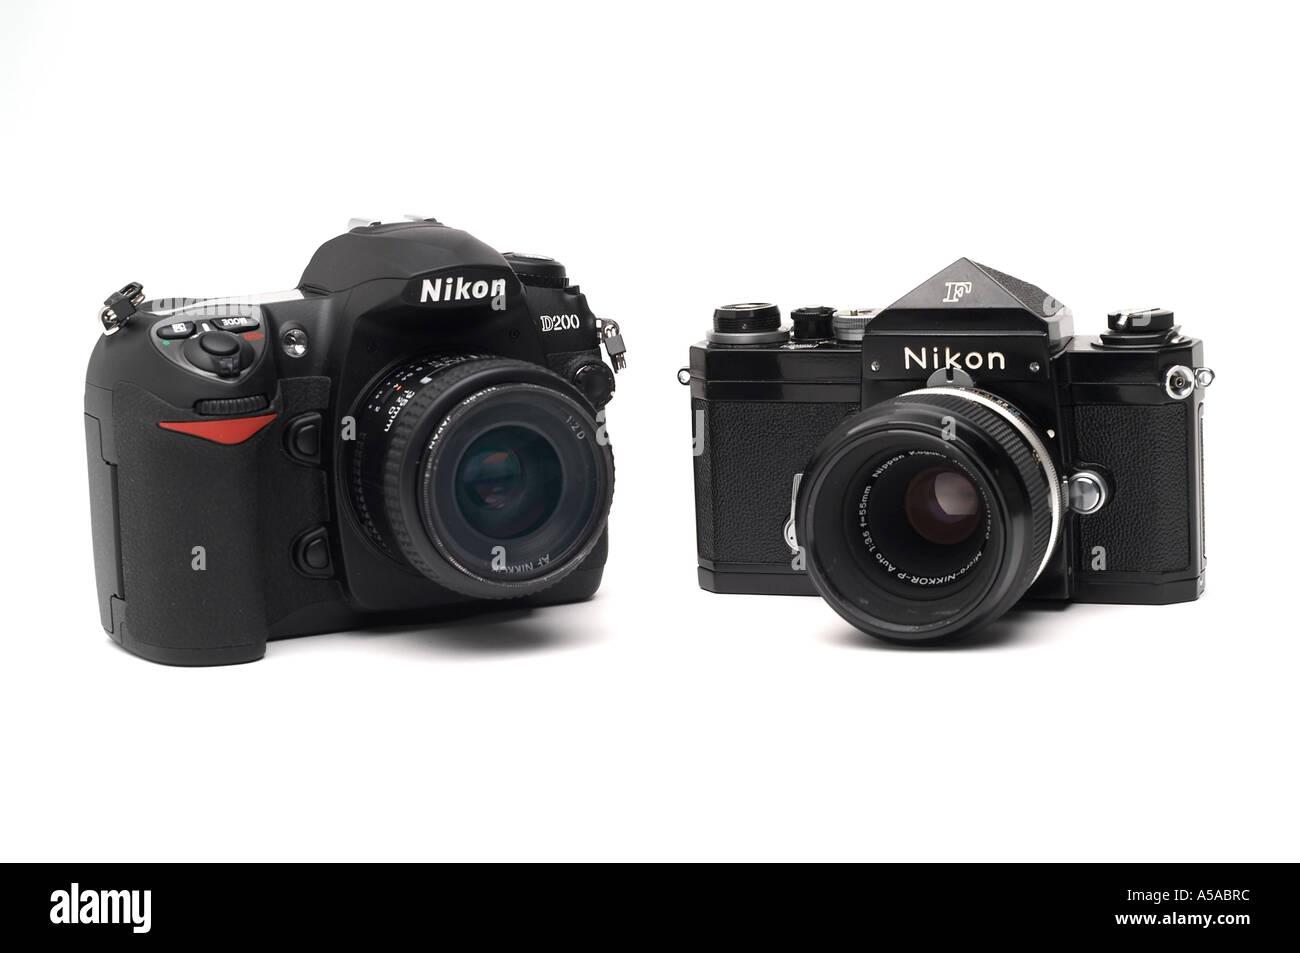 Nikon D200 digital SLR camera Nikon F 35 mm film camera - Stock Image